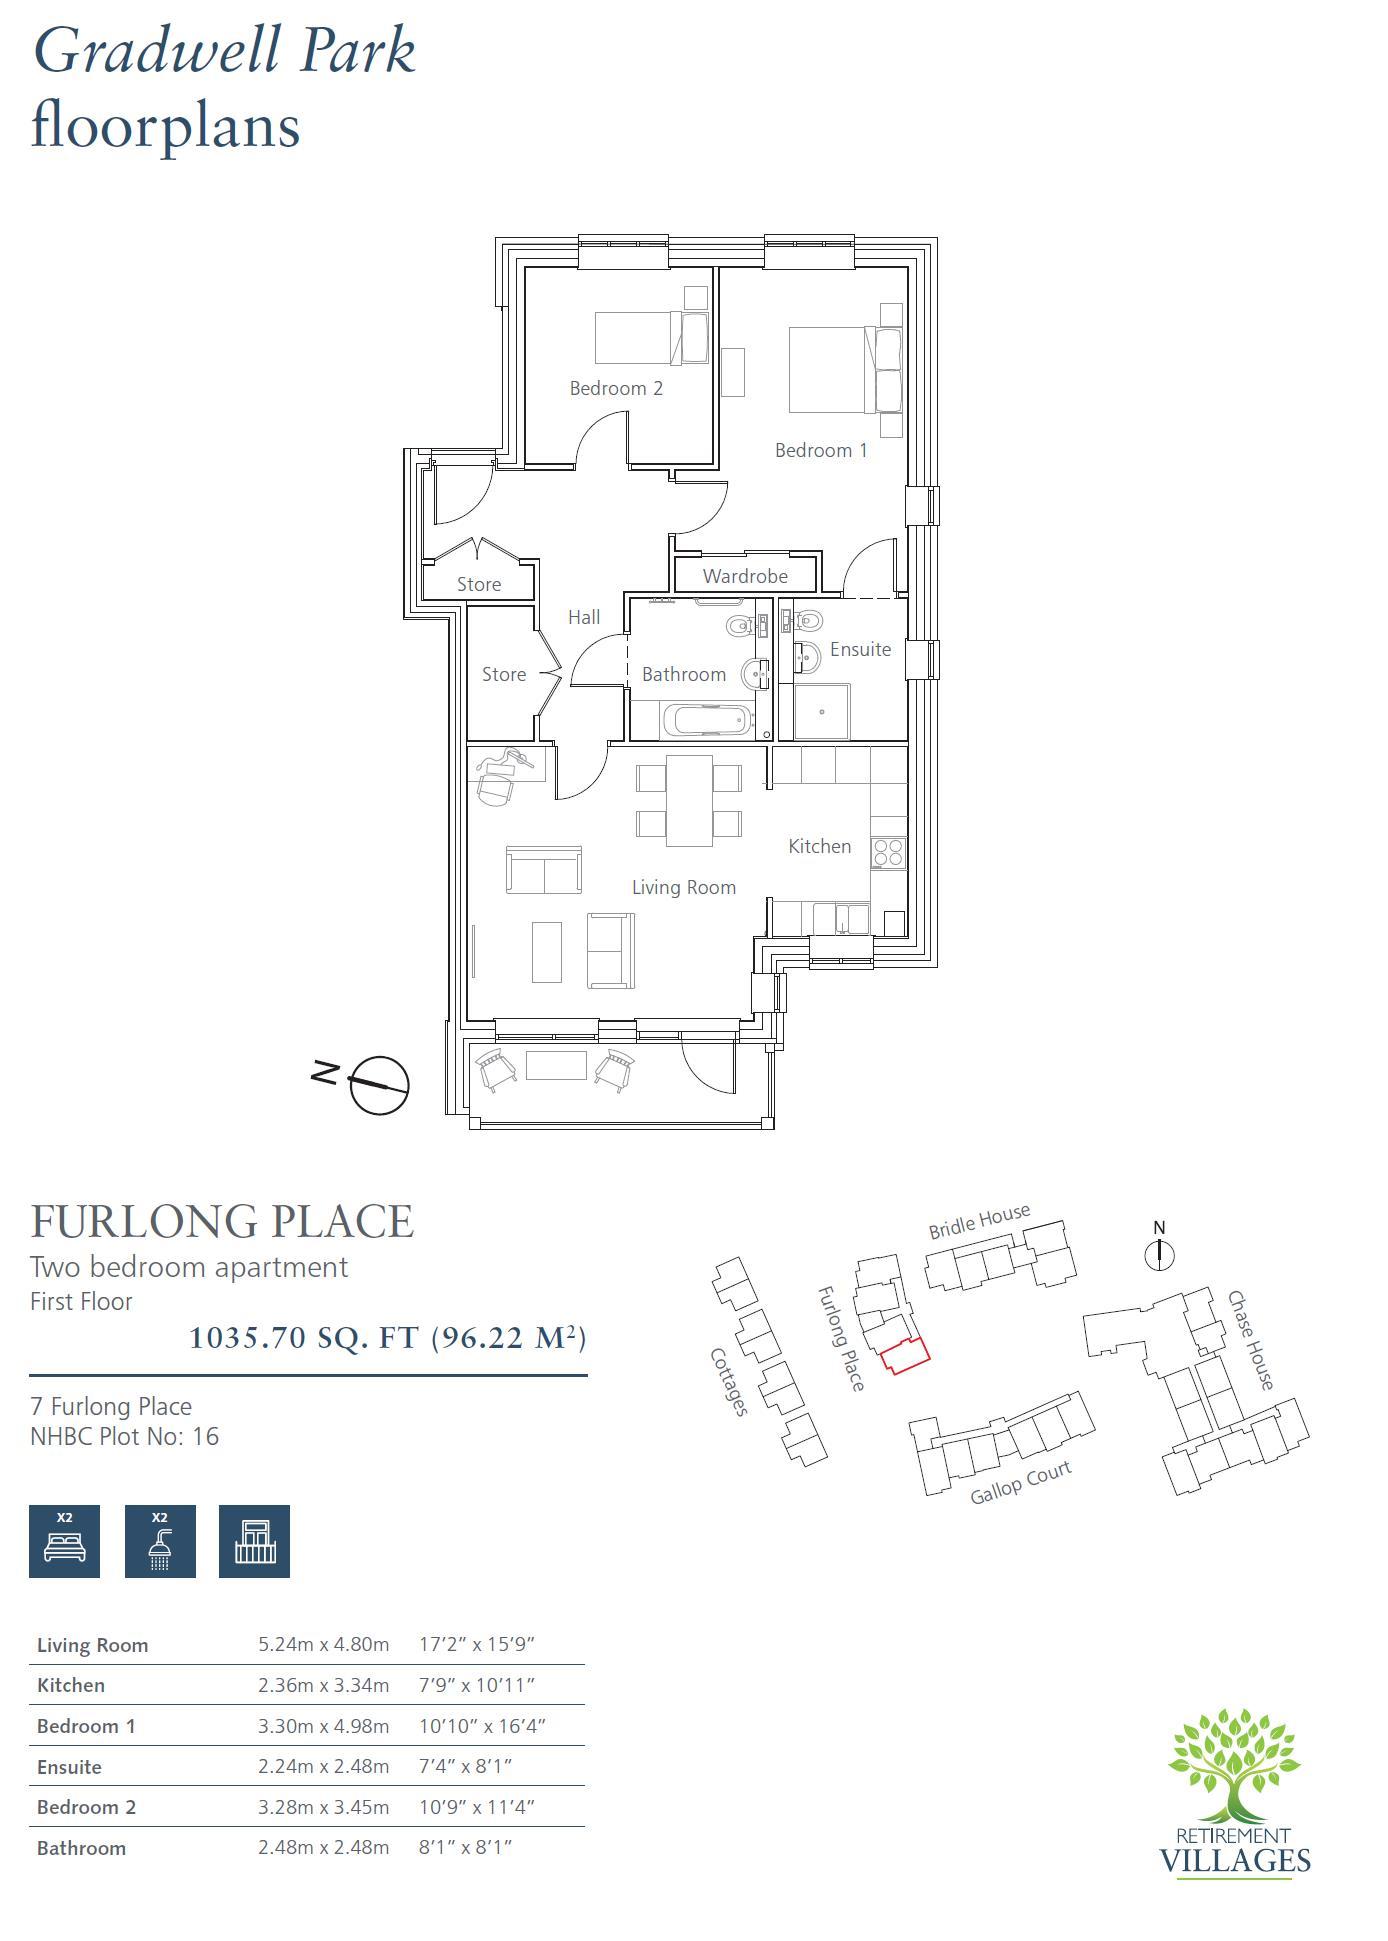 New Build, 7 Furlong Place Floorplan